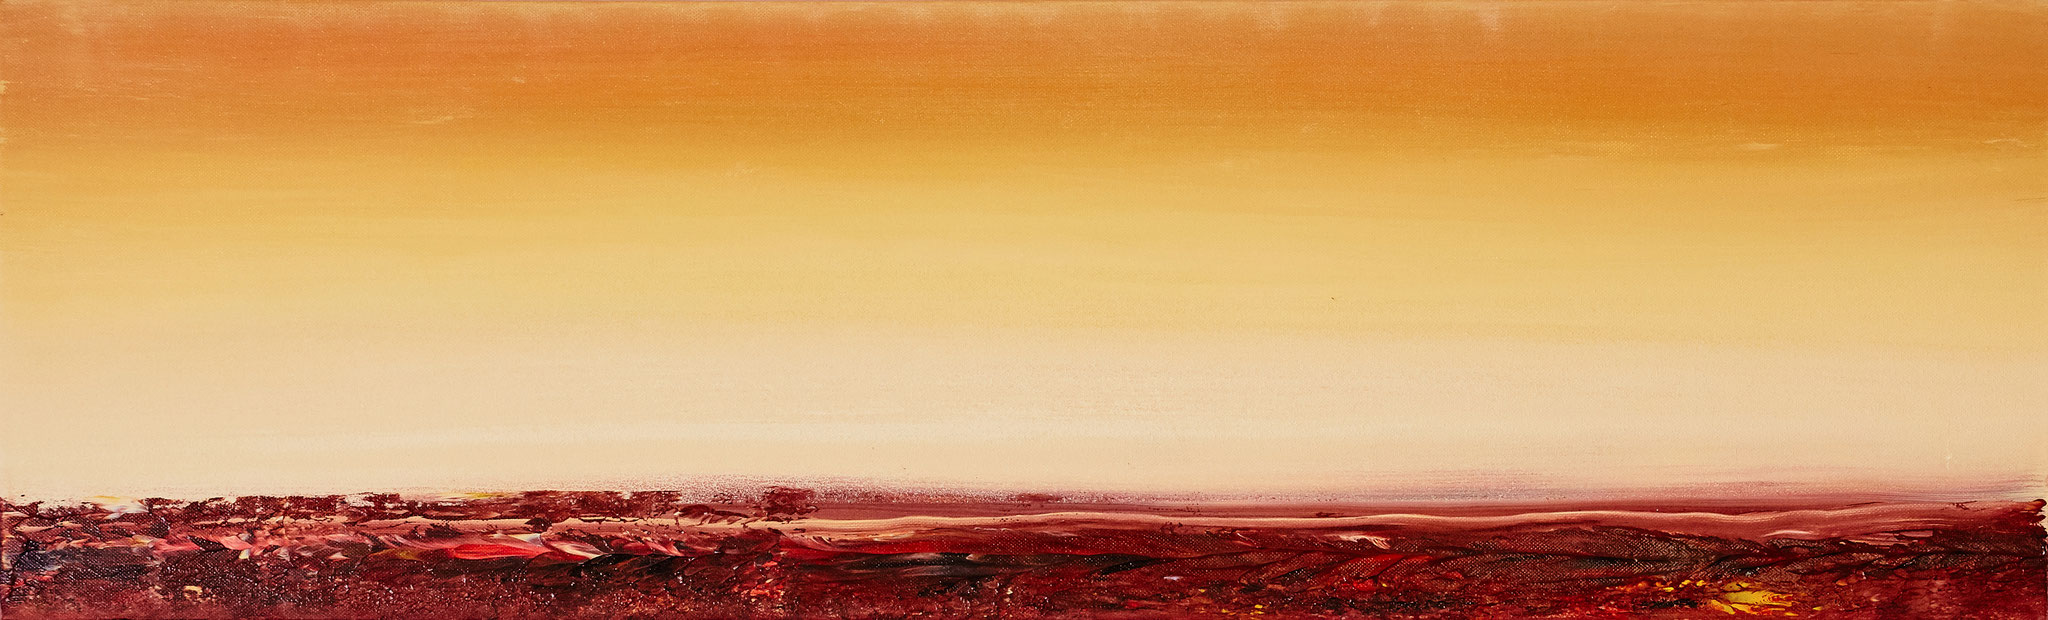 ›Sunrise‹, Acryl auf Leinwand, 100 x 30 cm, 2015